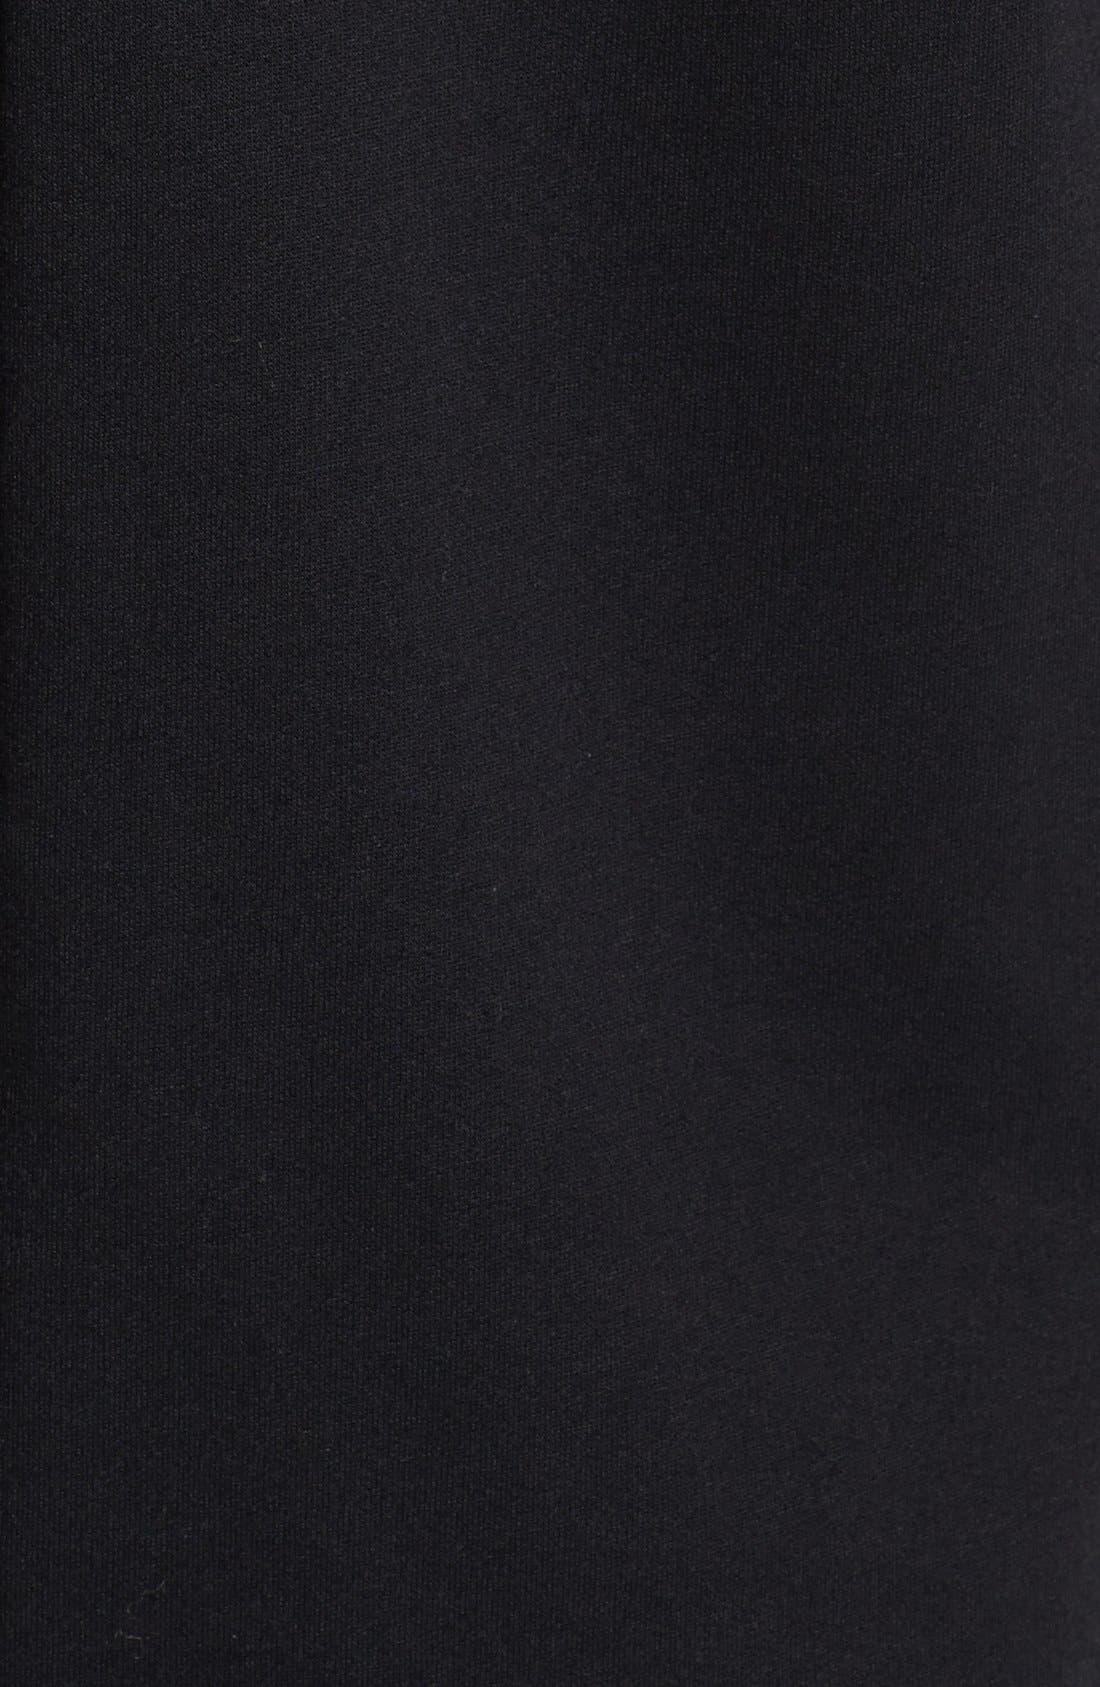 TOPMAN, Glow In The Dark Skeleton Print Bodysuit, Alternate thumbnail 2, color, 001